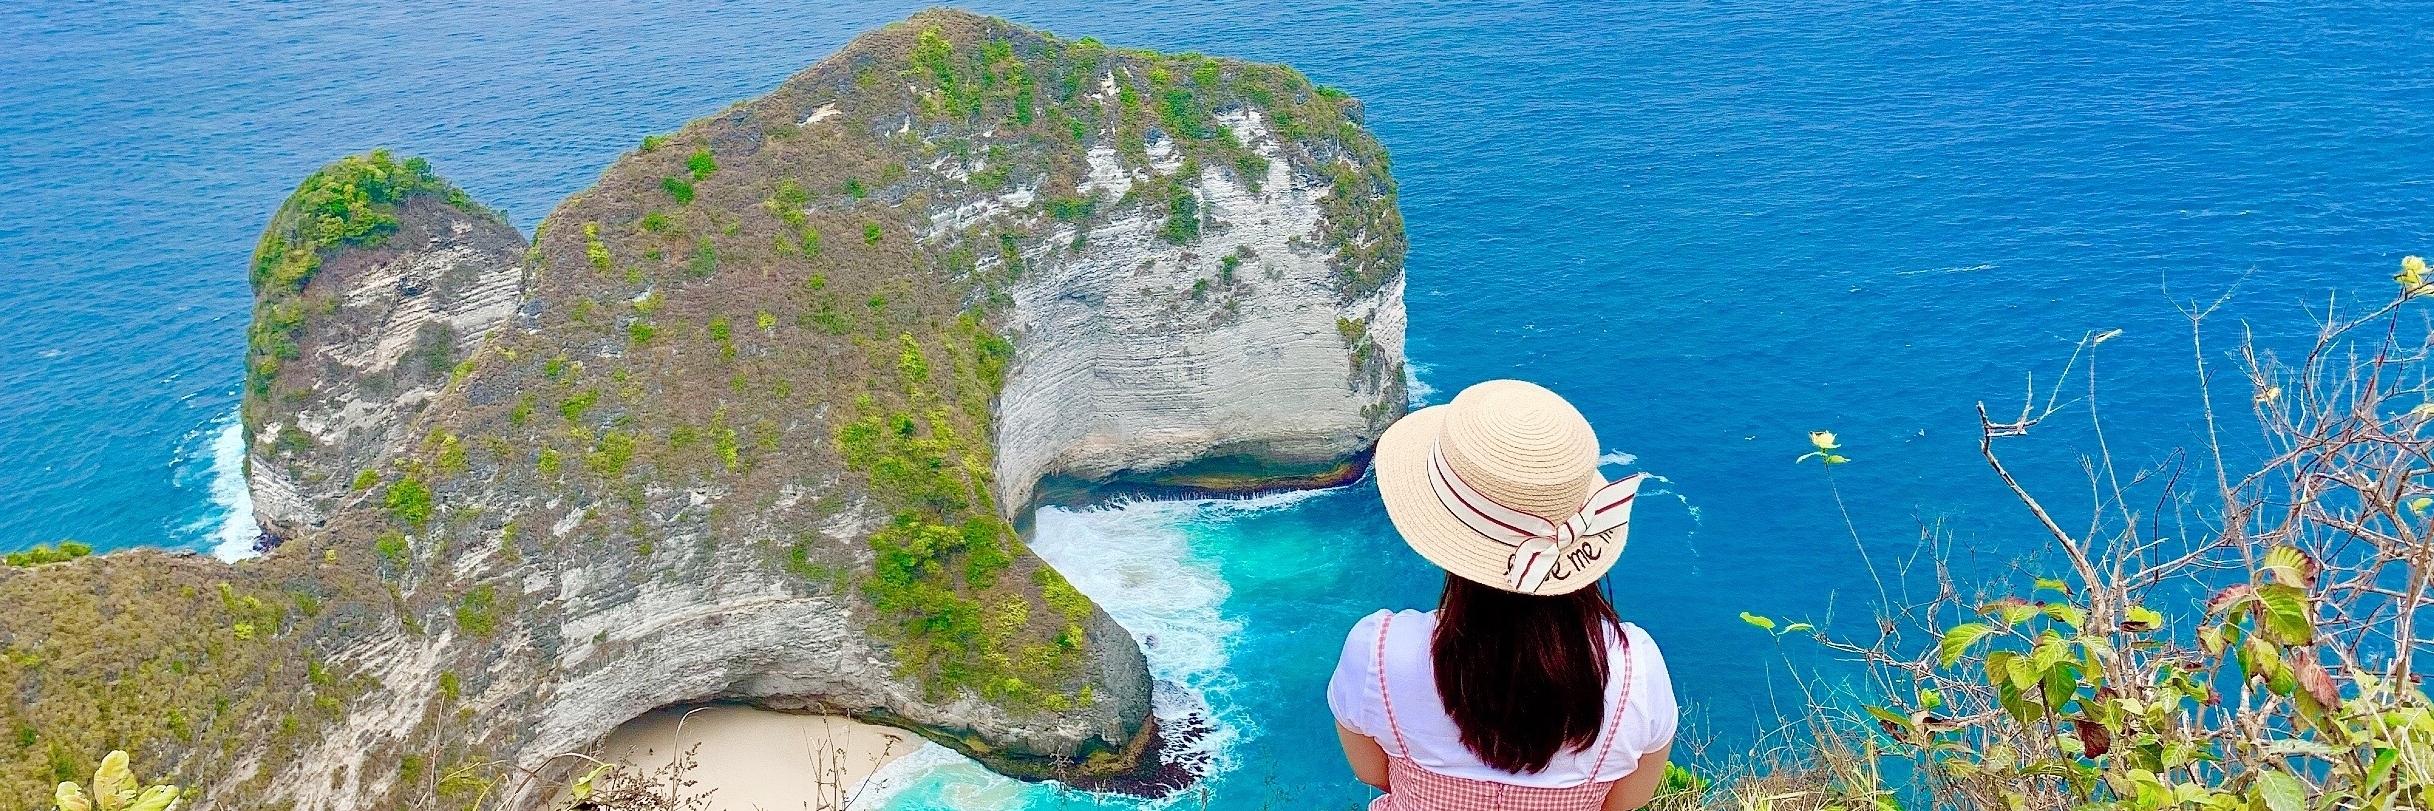 https://gody.vn/blog/flowerhanh4475/post/review-bali-indonesia-den-voi-bali-ban-se-thay-tho-cung-nhe-nhang-4811